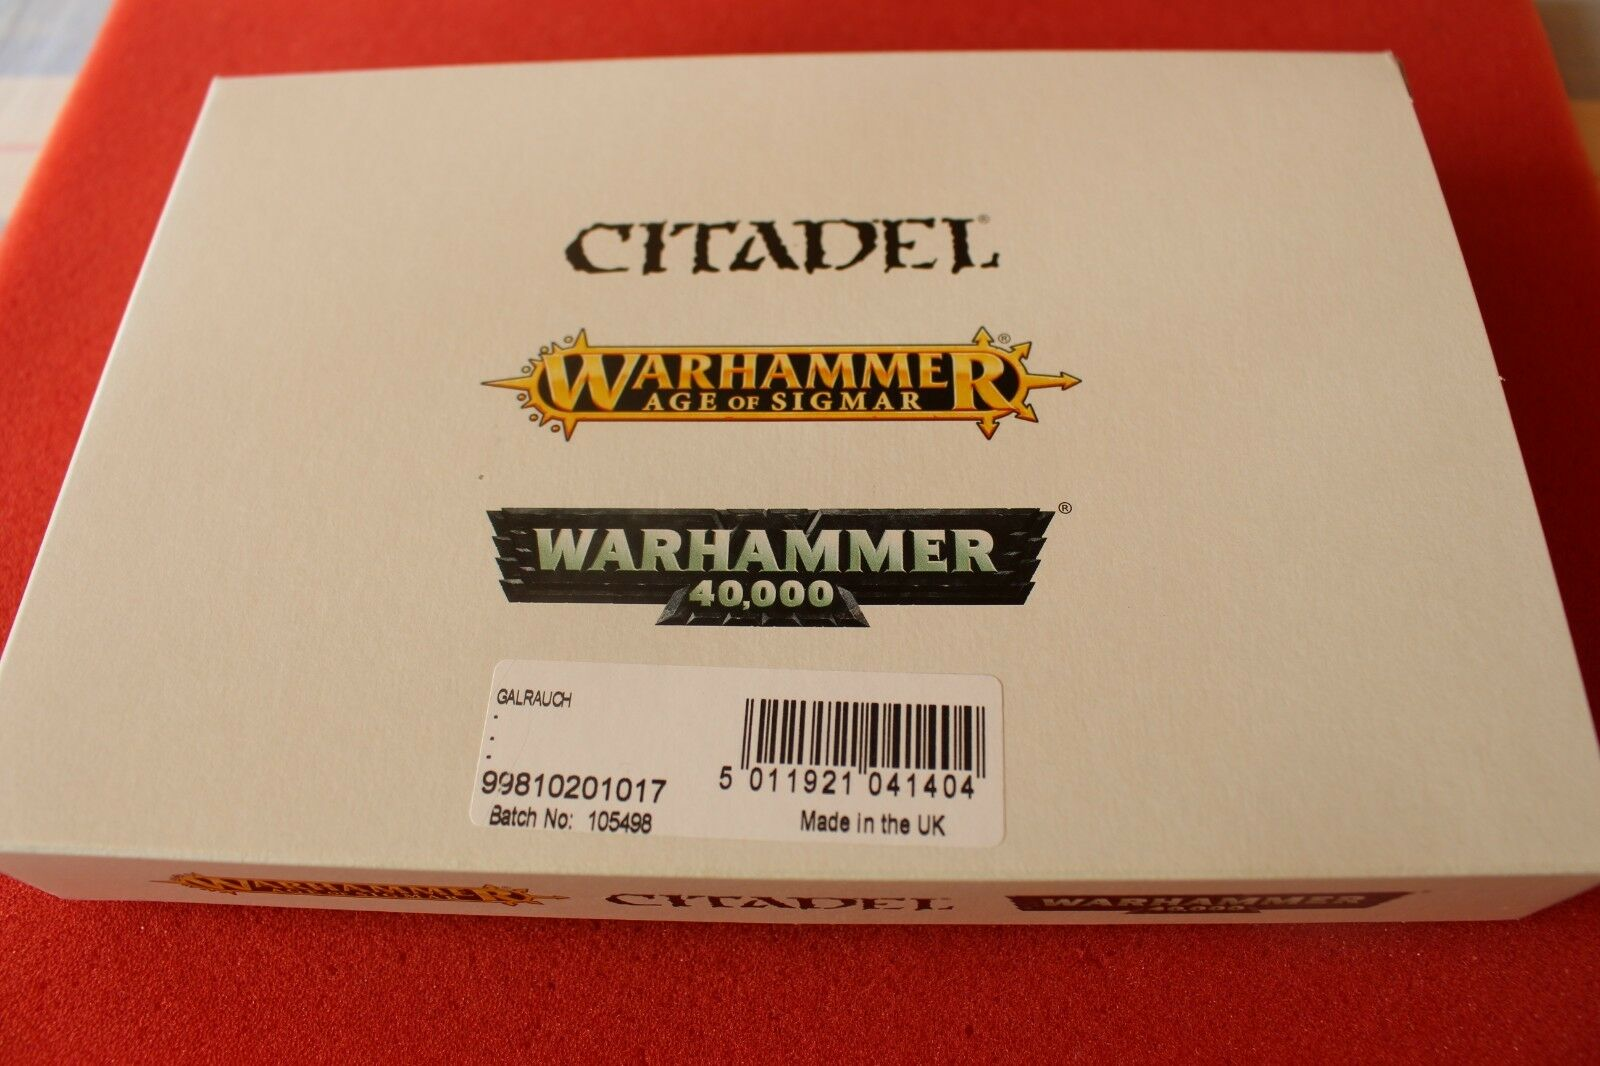 Games Workshop Warhammer Chaos Dragon galrauch New Neuf dans sa boîte GW Finecast Épuisé Résine GW